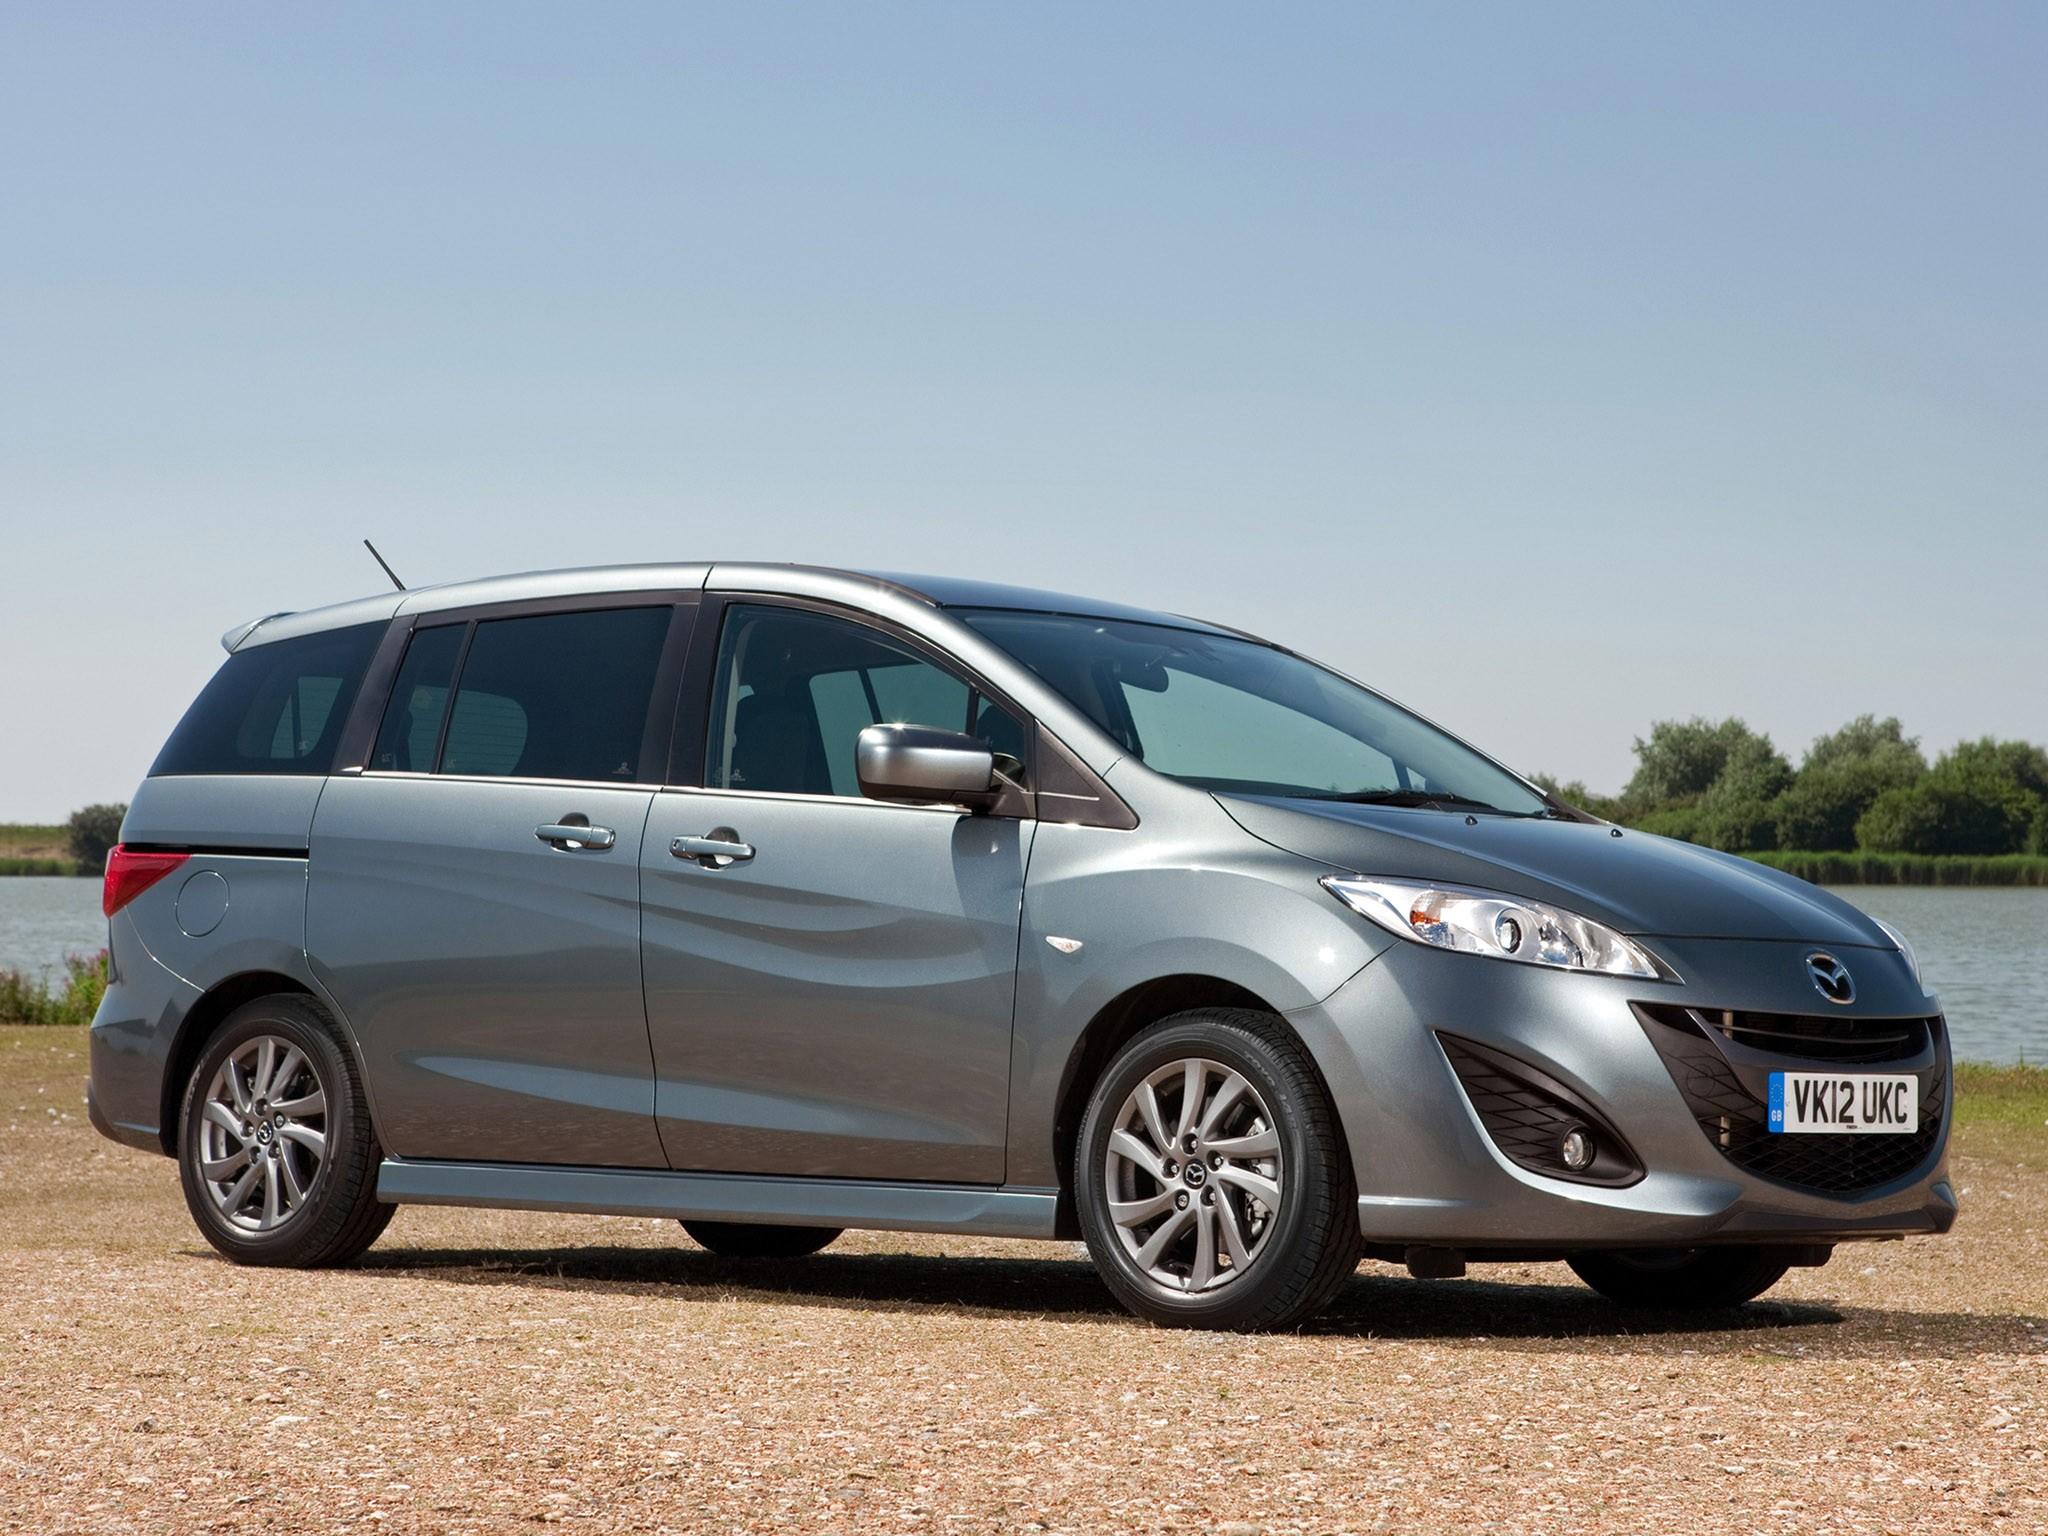 2012 Mazda 5 Venture